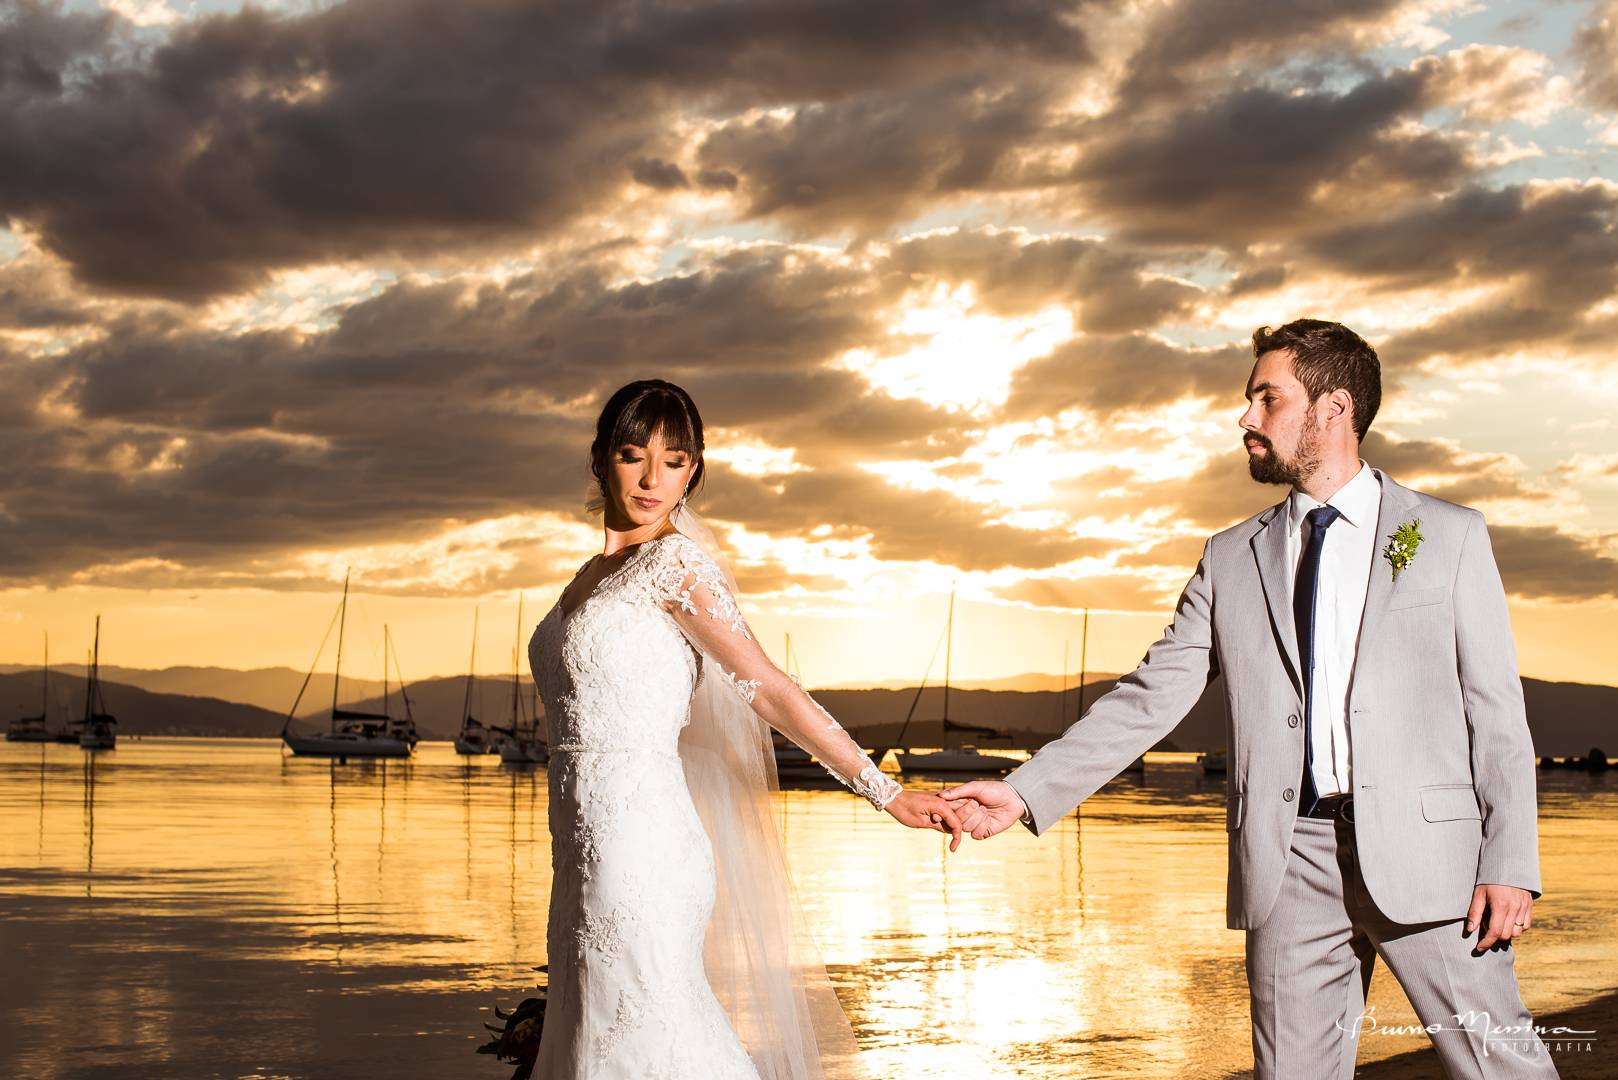 casamento-ao-ar-livre-casamento-na-praia-fotos-casamento-de-dia3